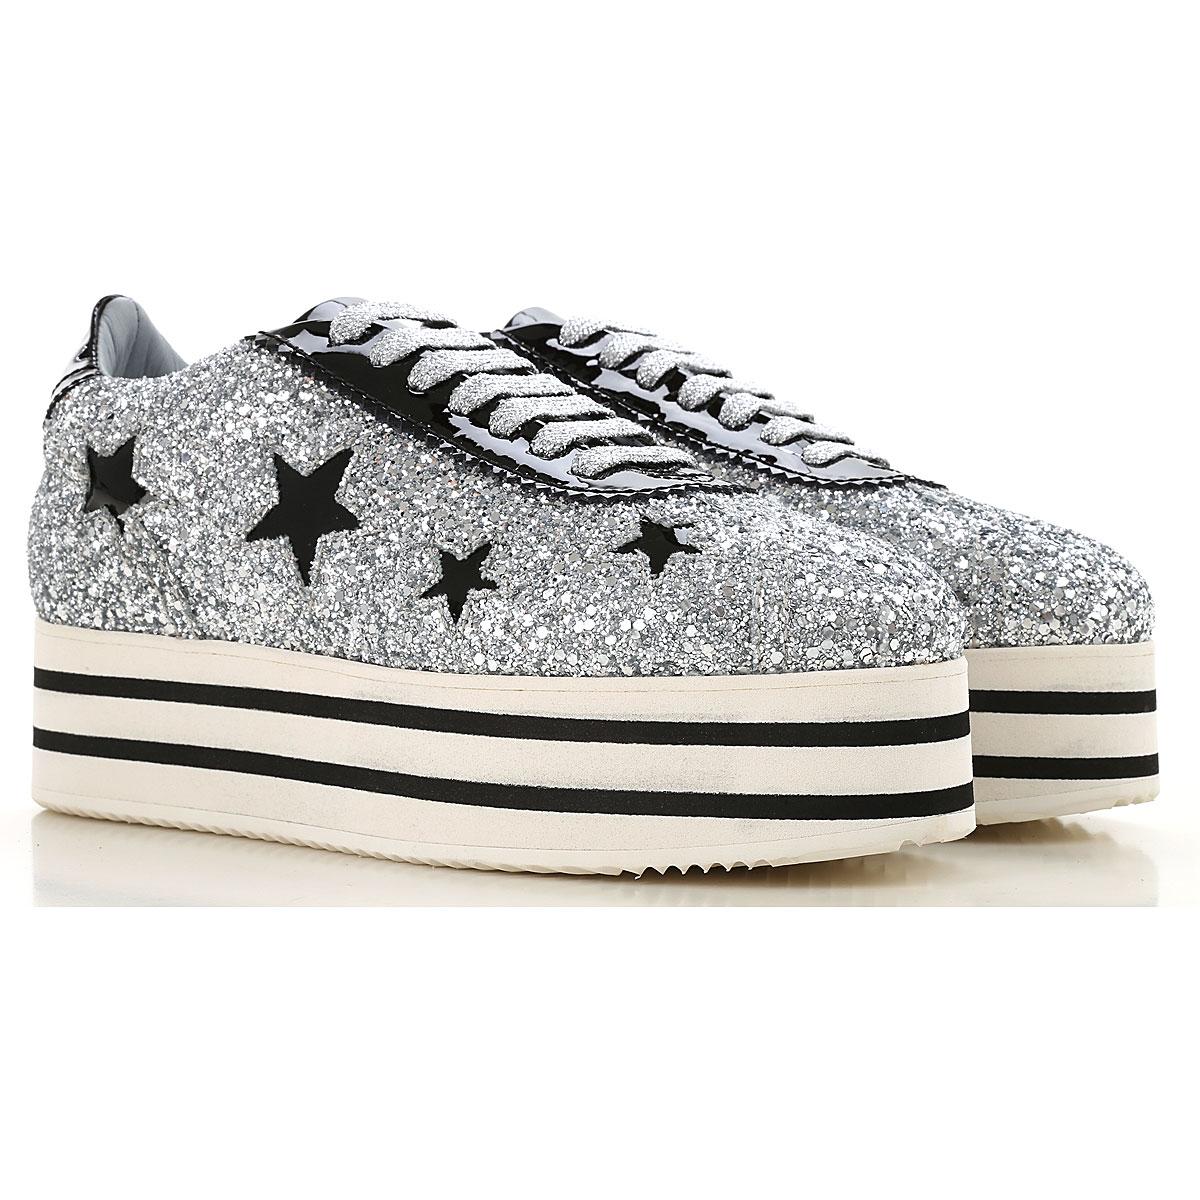 Chiara Ferragni Sneakers for Women On Sale in Outlet, Silver, Glittered Leather, 2019, 6 9